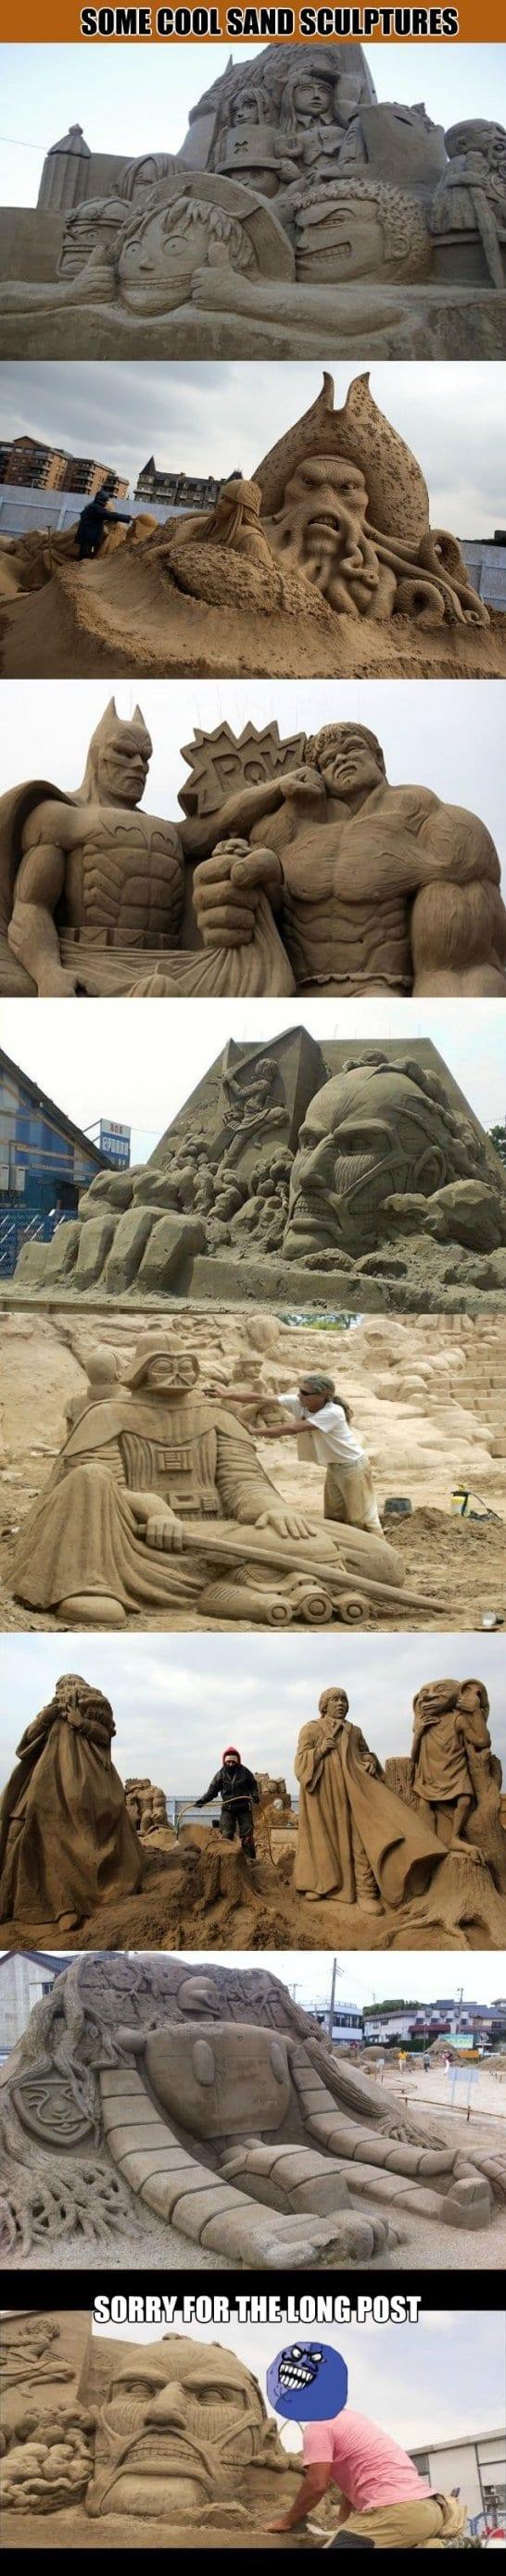 funny-cool-sand-sculptures-meme-jokes-2014